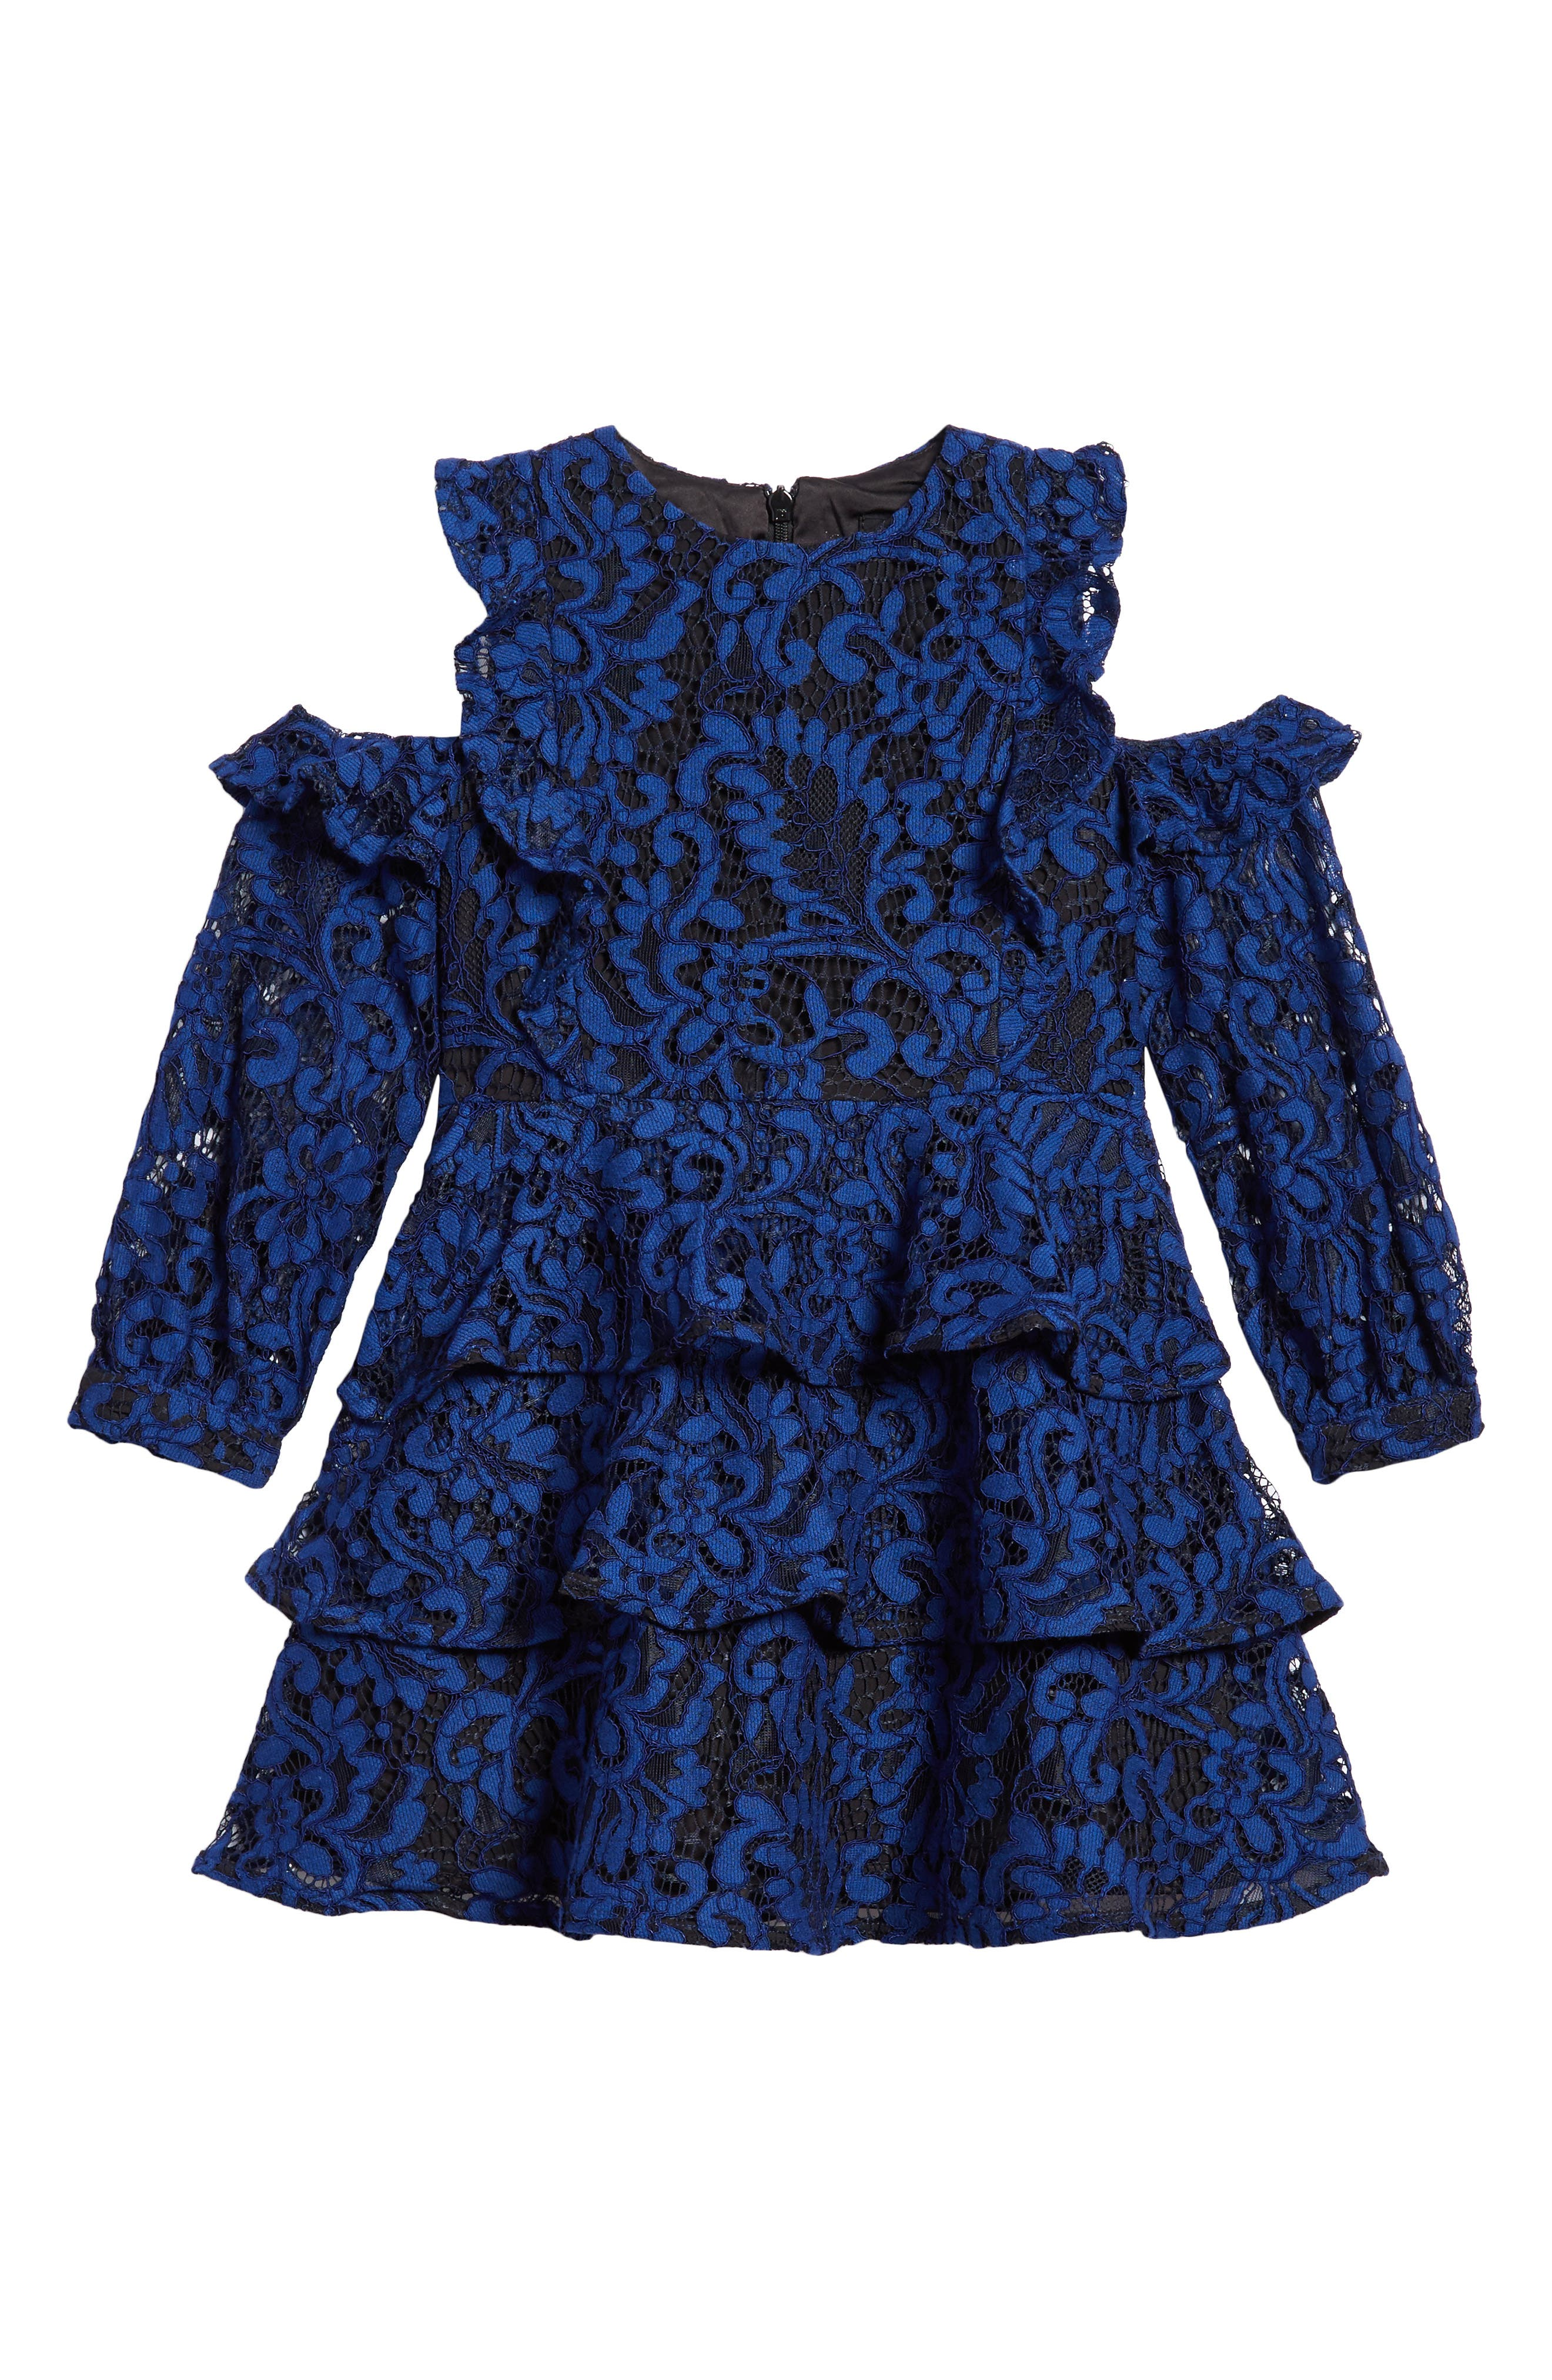 Ruffle Lace Cold Shoulder Dress,                         Main,                         color, 412